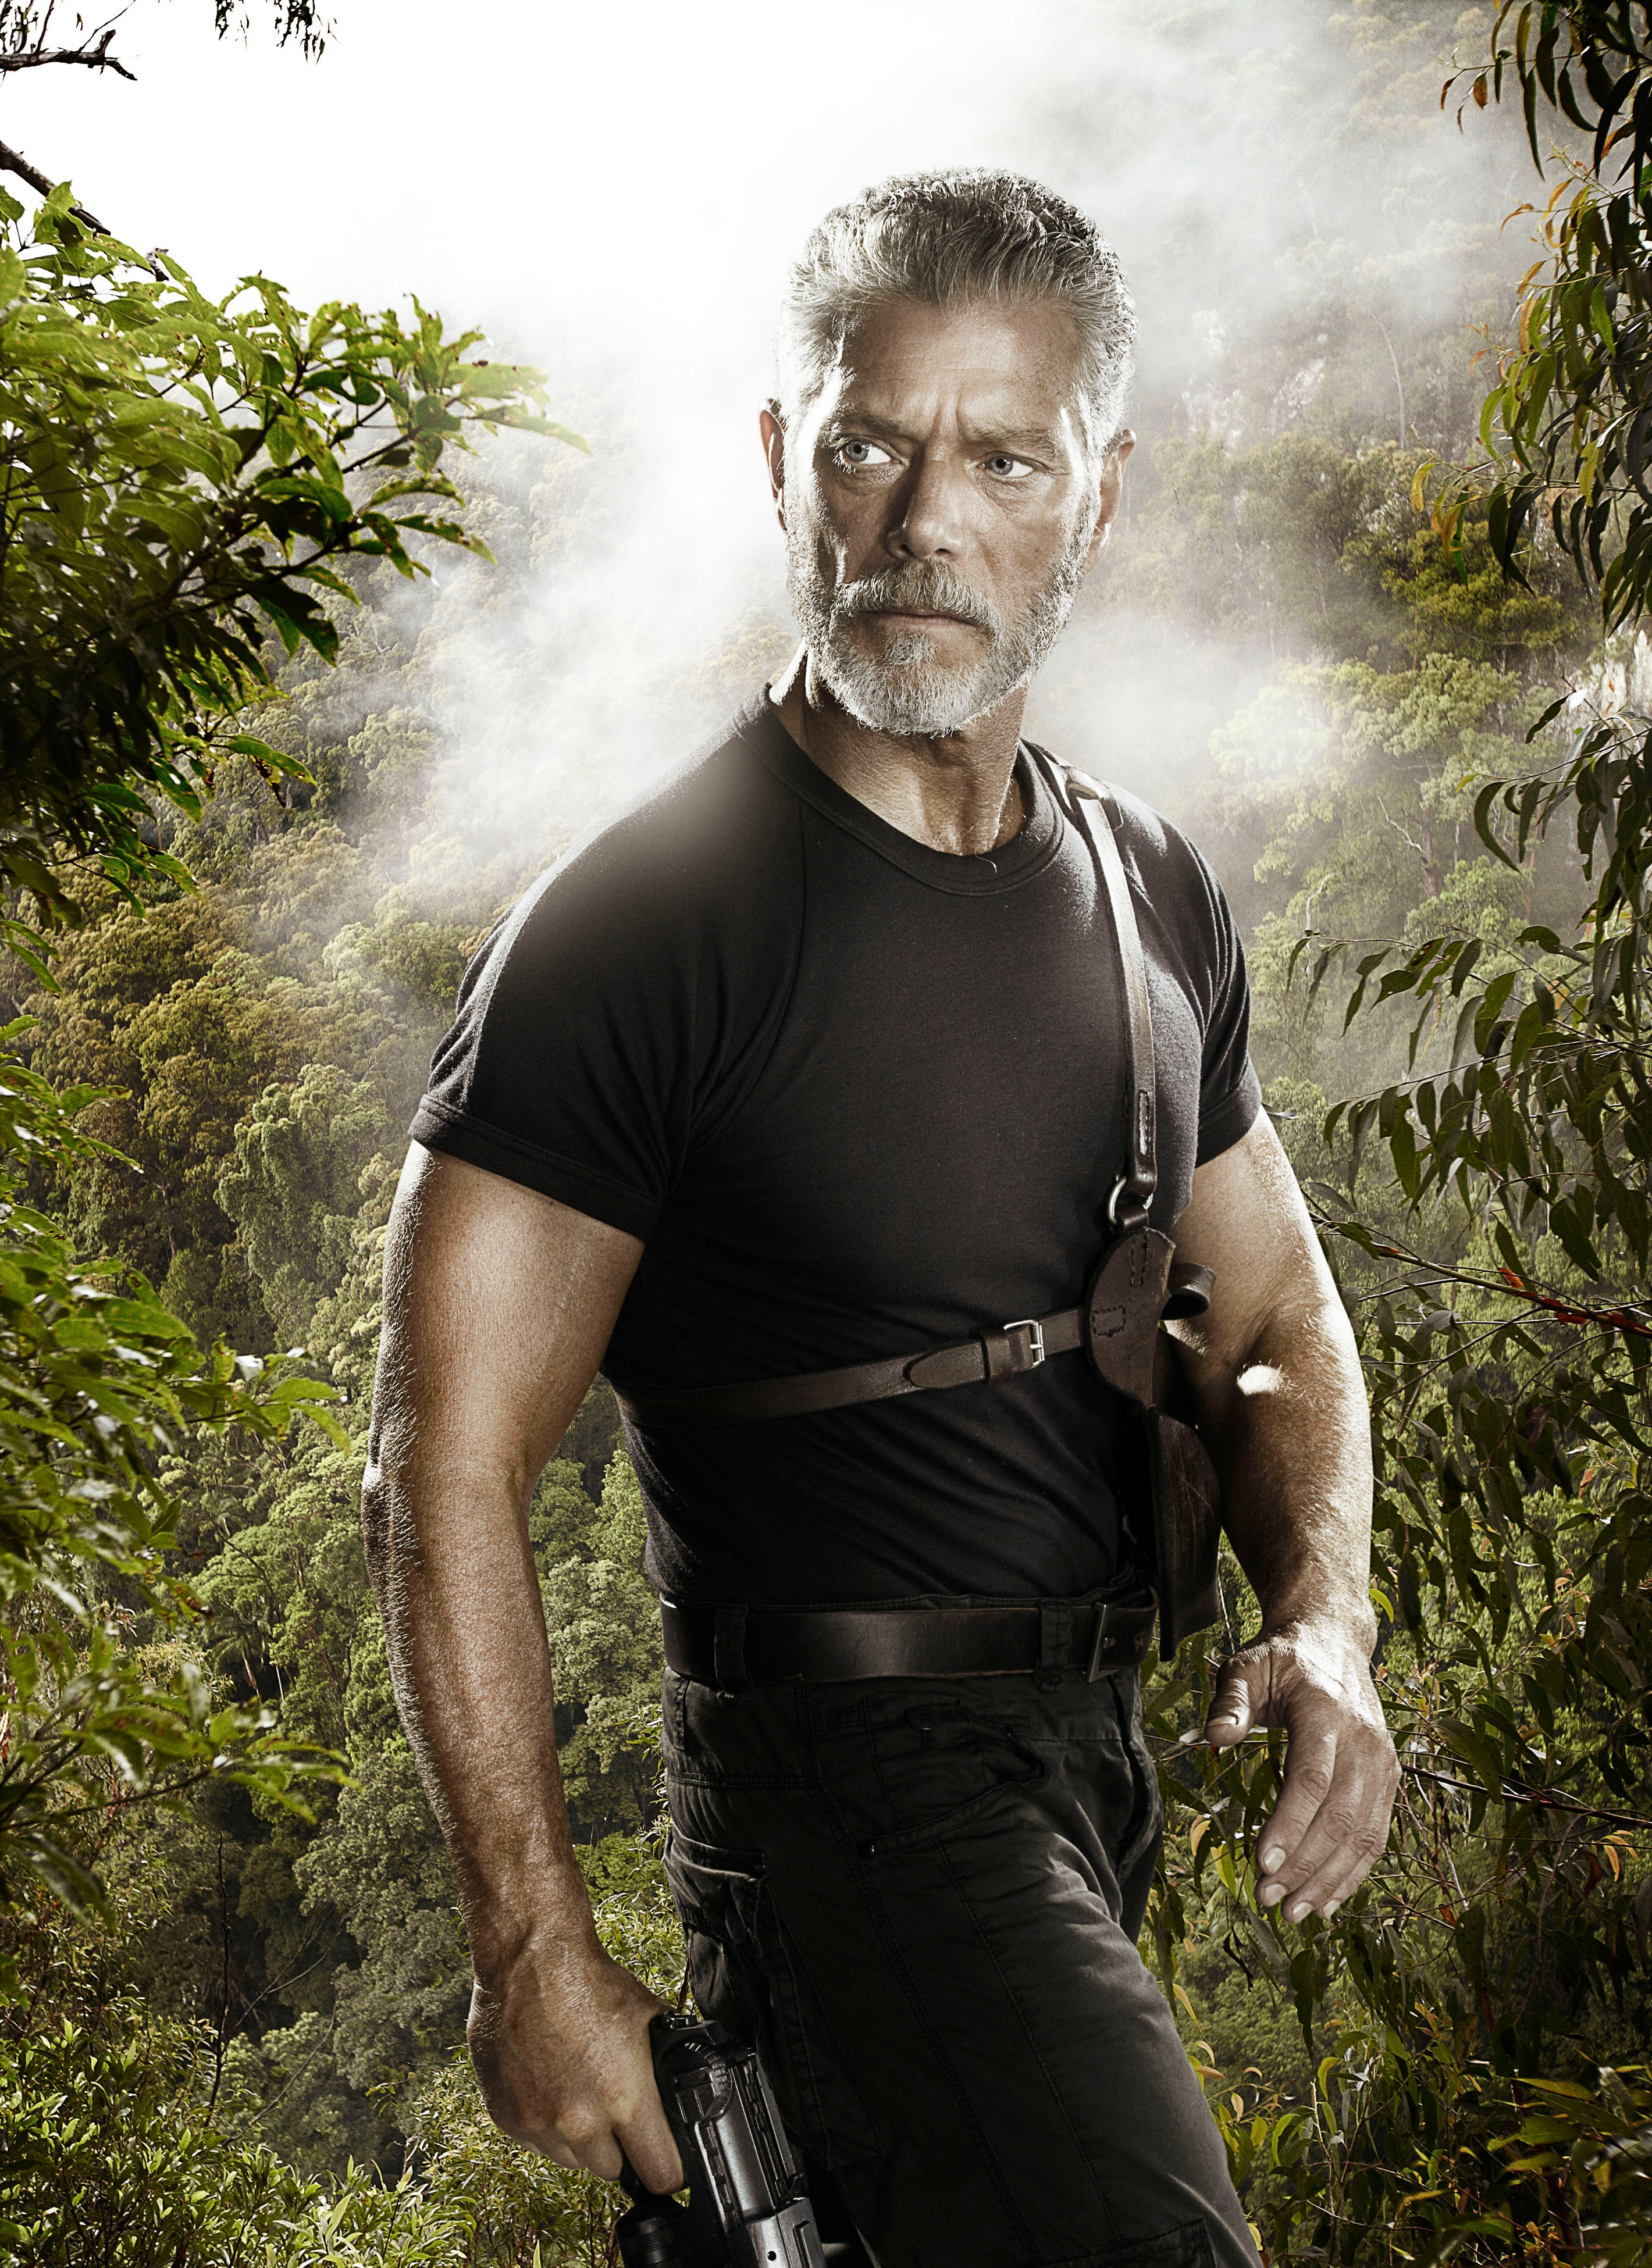 Terra nova season 2 wikipedia : Deadbeat tv trailer